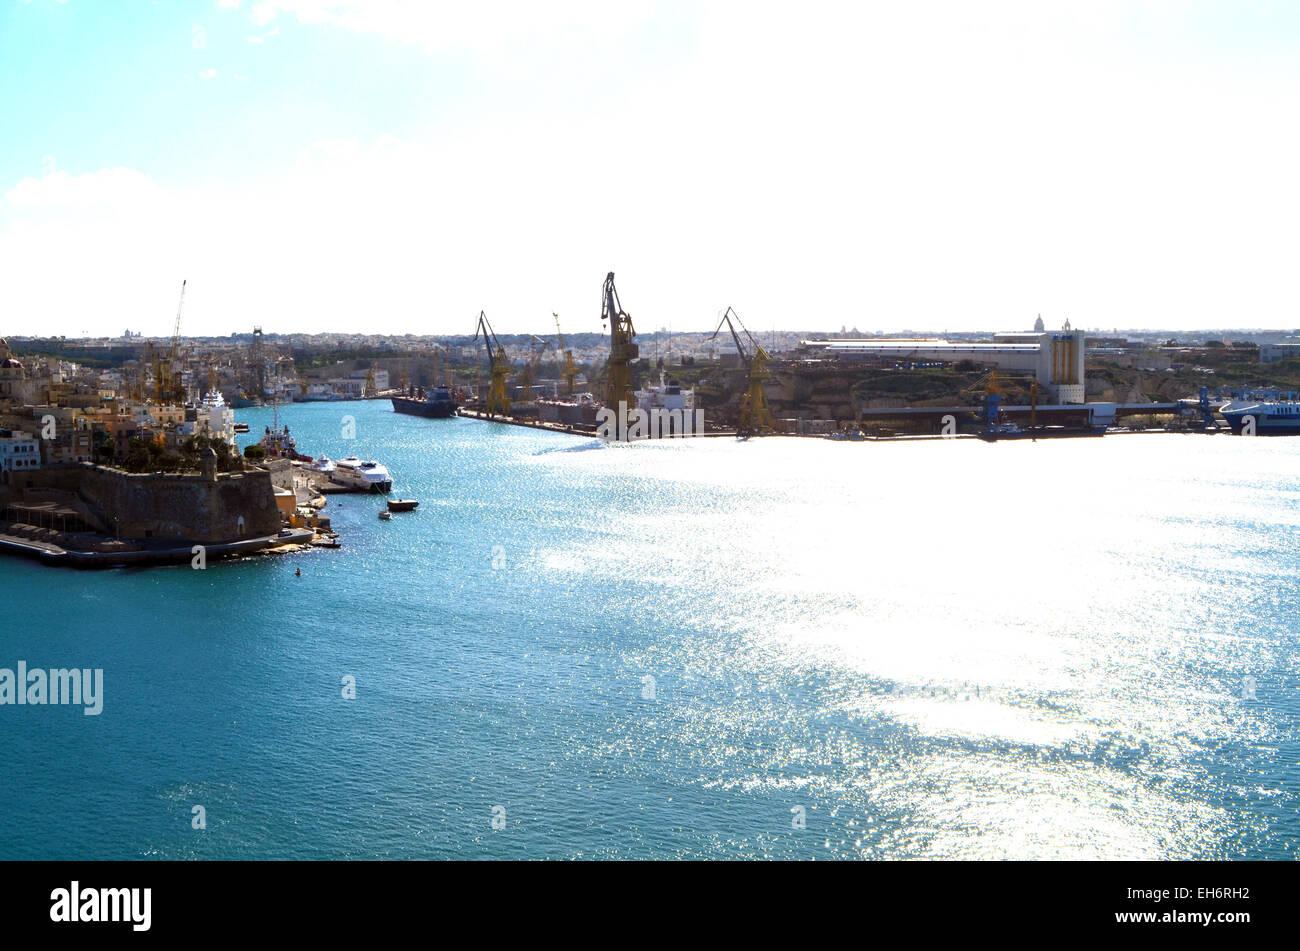 Malta, Valletta, A view if the Grand Harbour over Valletta. - Stock Image